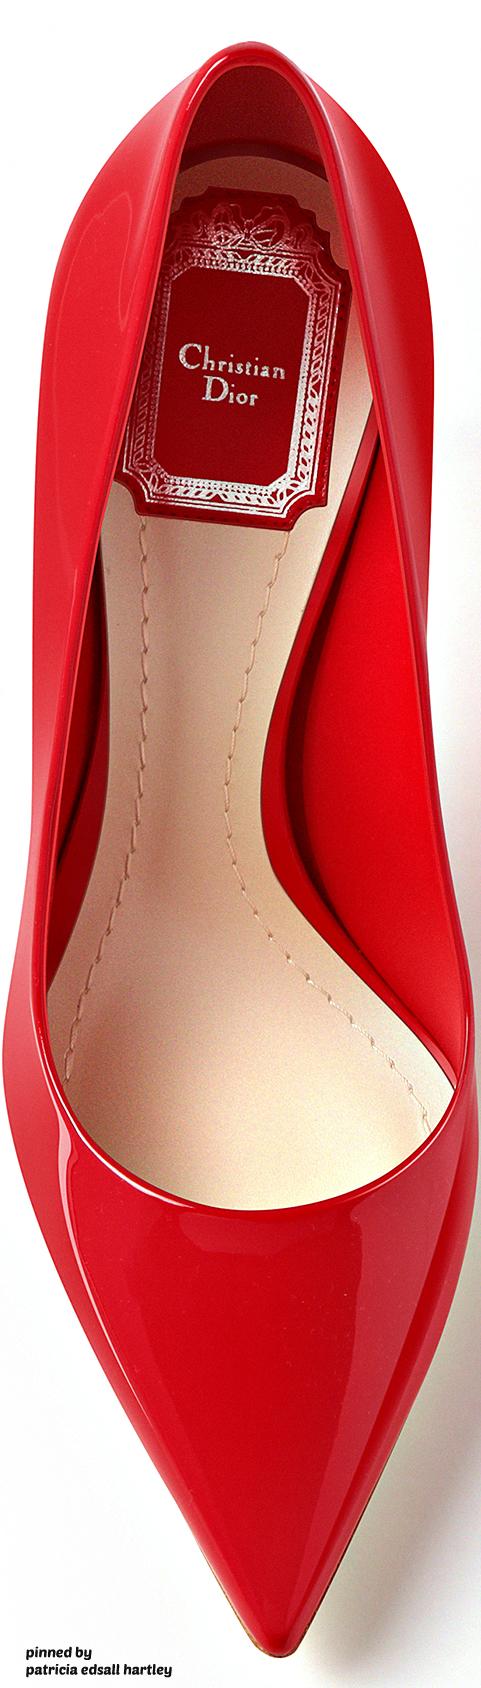 Dior Red Patent Calfskin Pump 2016